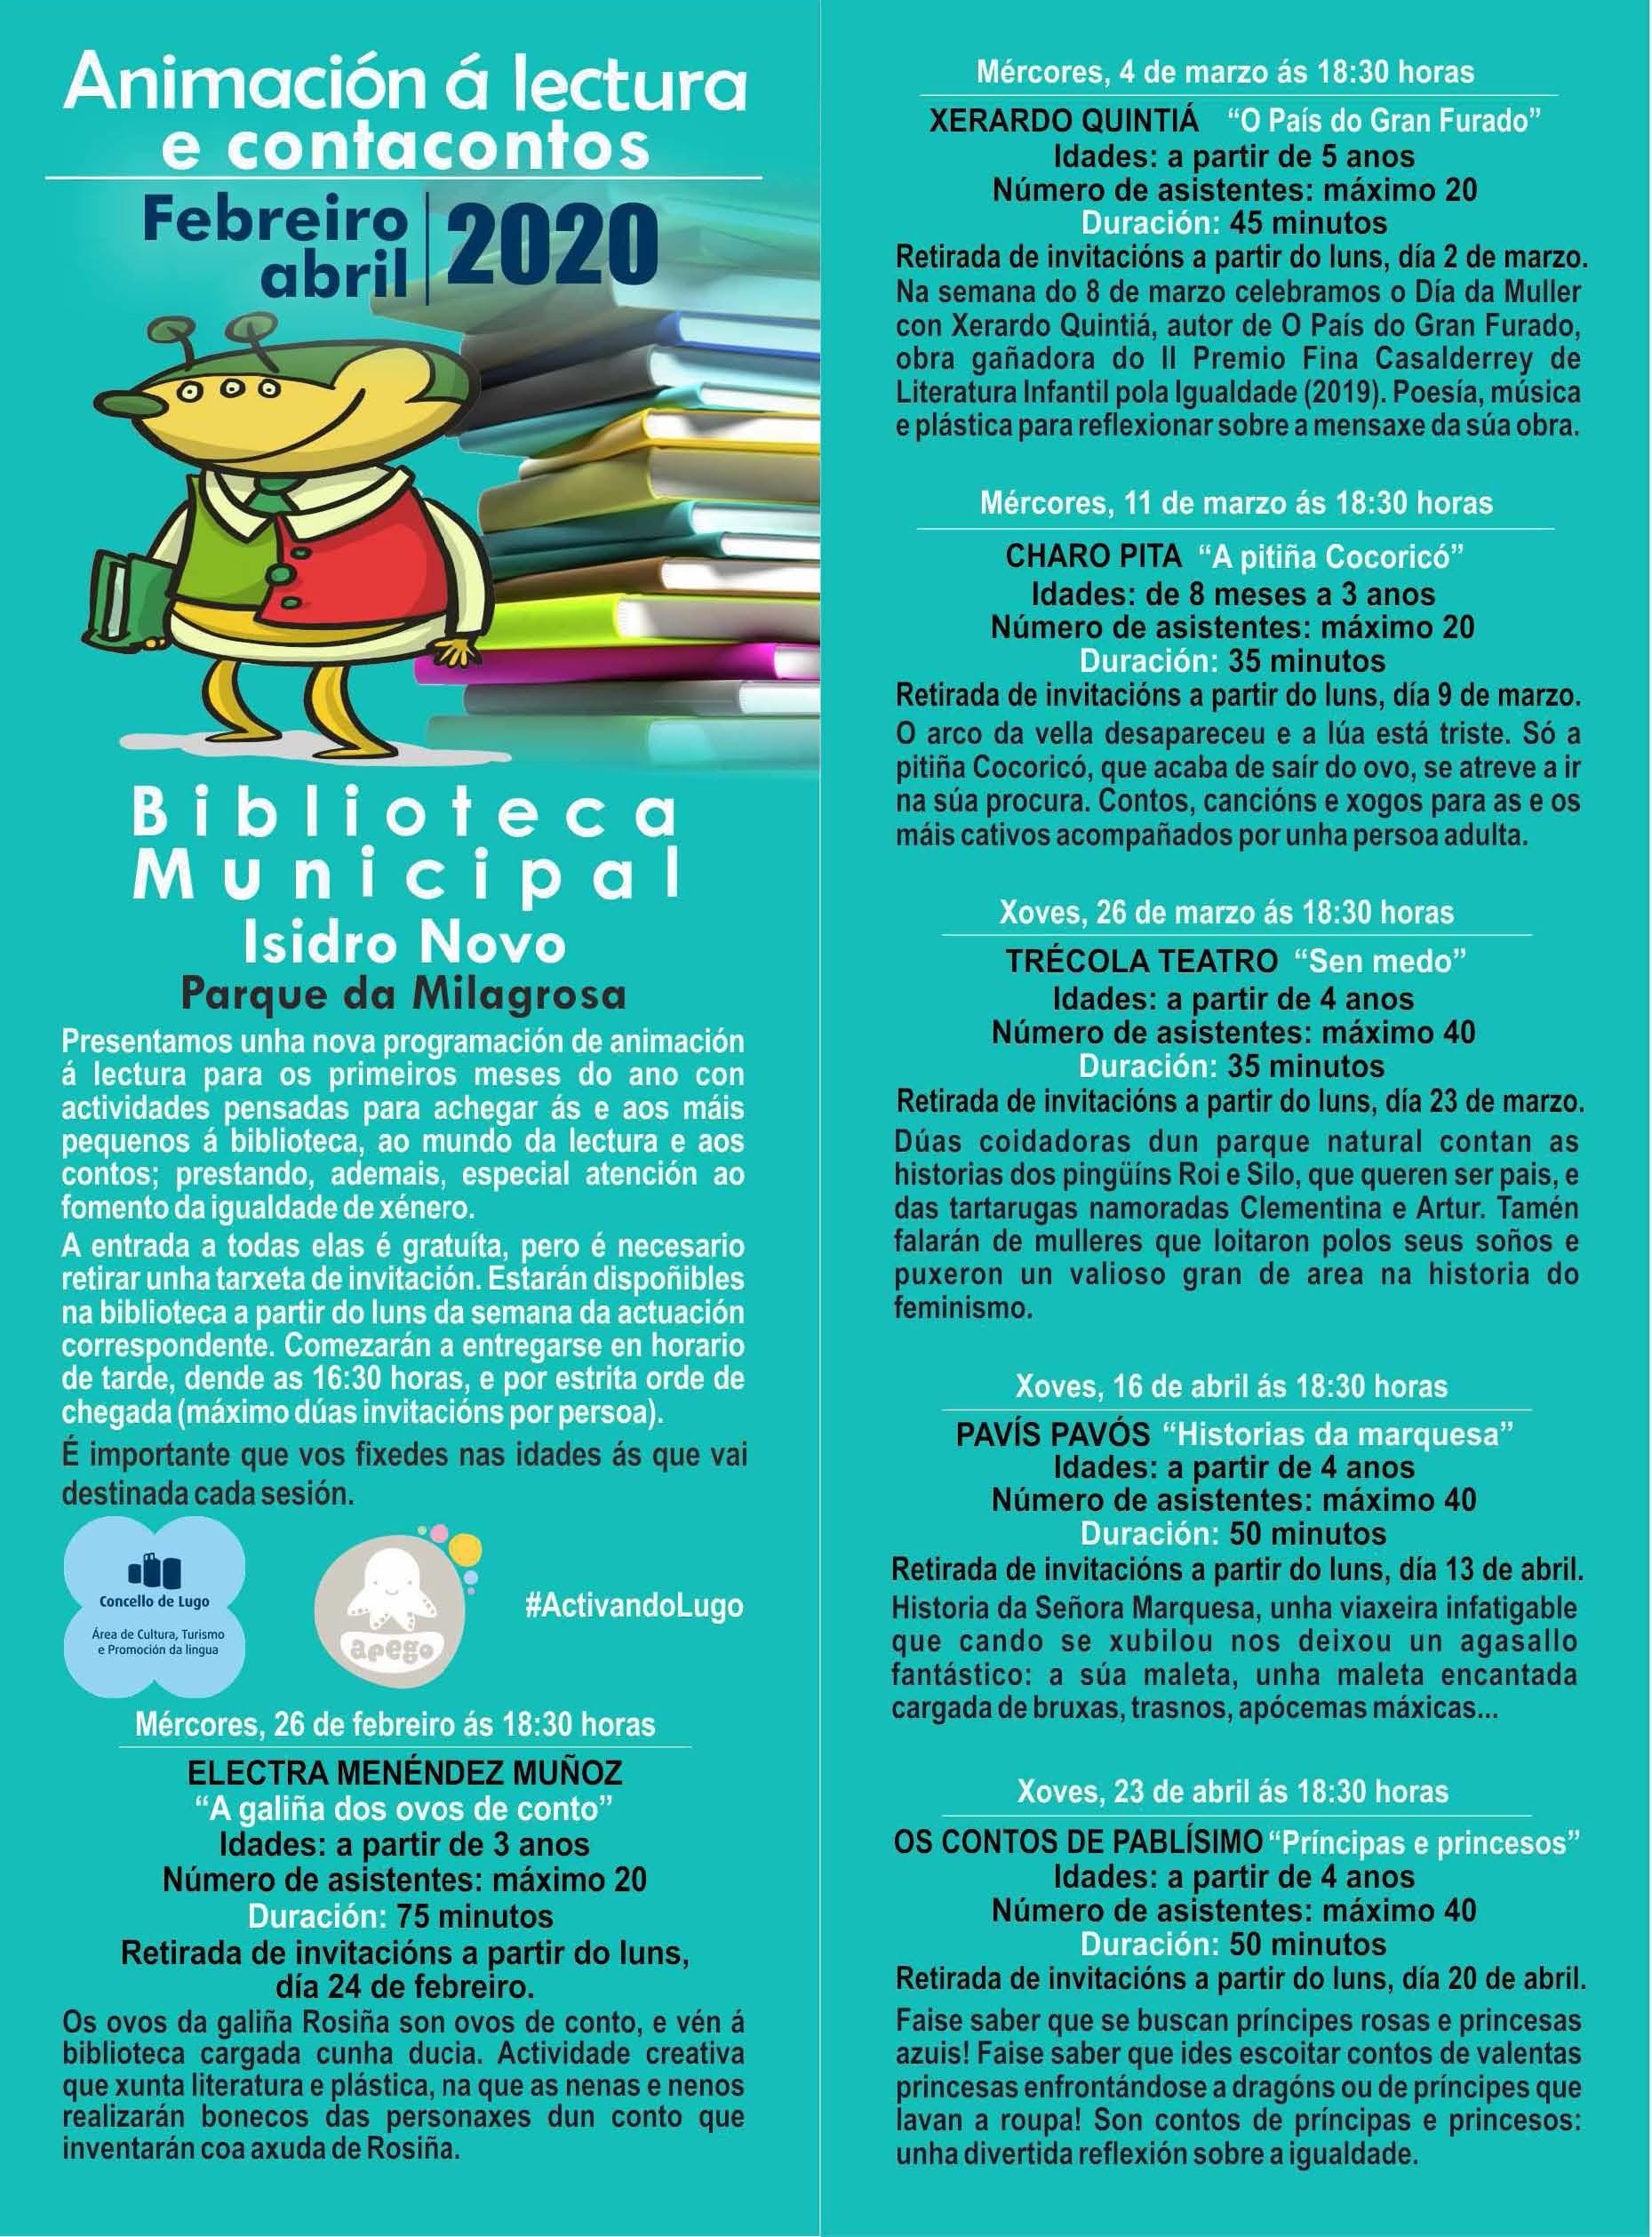 Cartel dos contacontos na biblioteca Isidro Novo